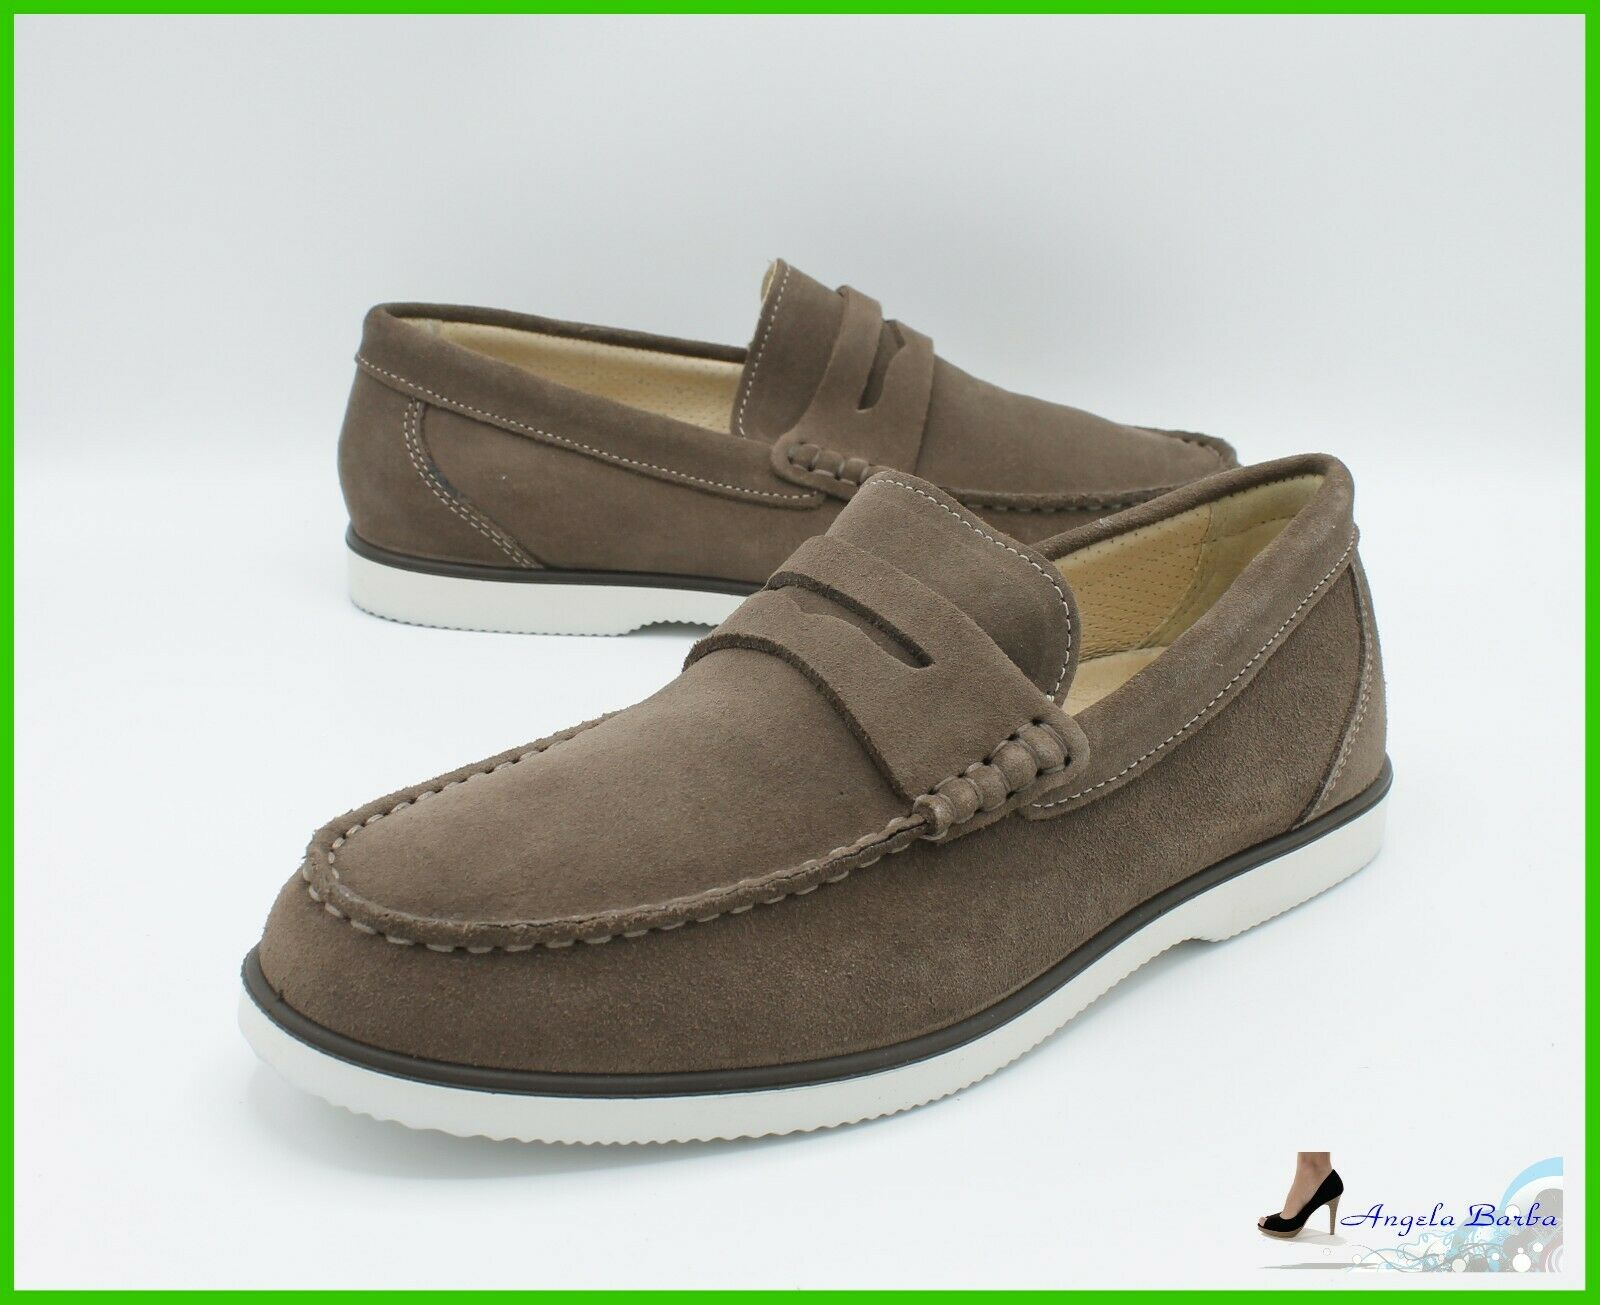 Loafers Men's Igi & Co shoes Suede and Leather Elegant Summer Moccasin